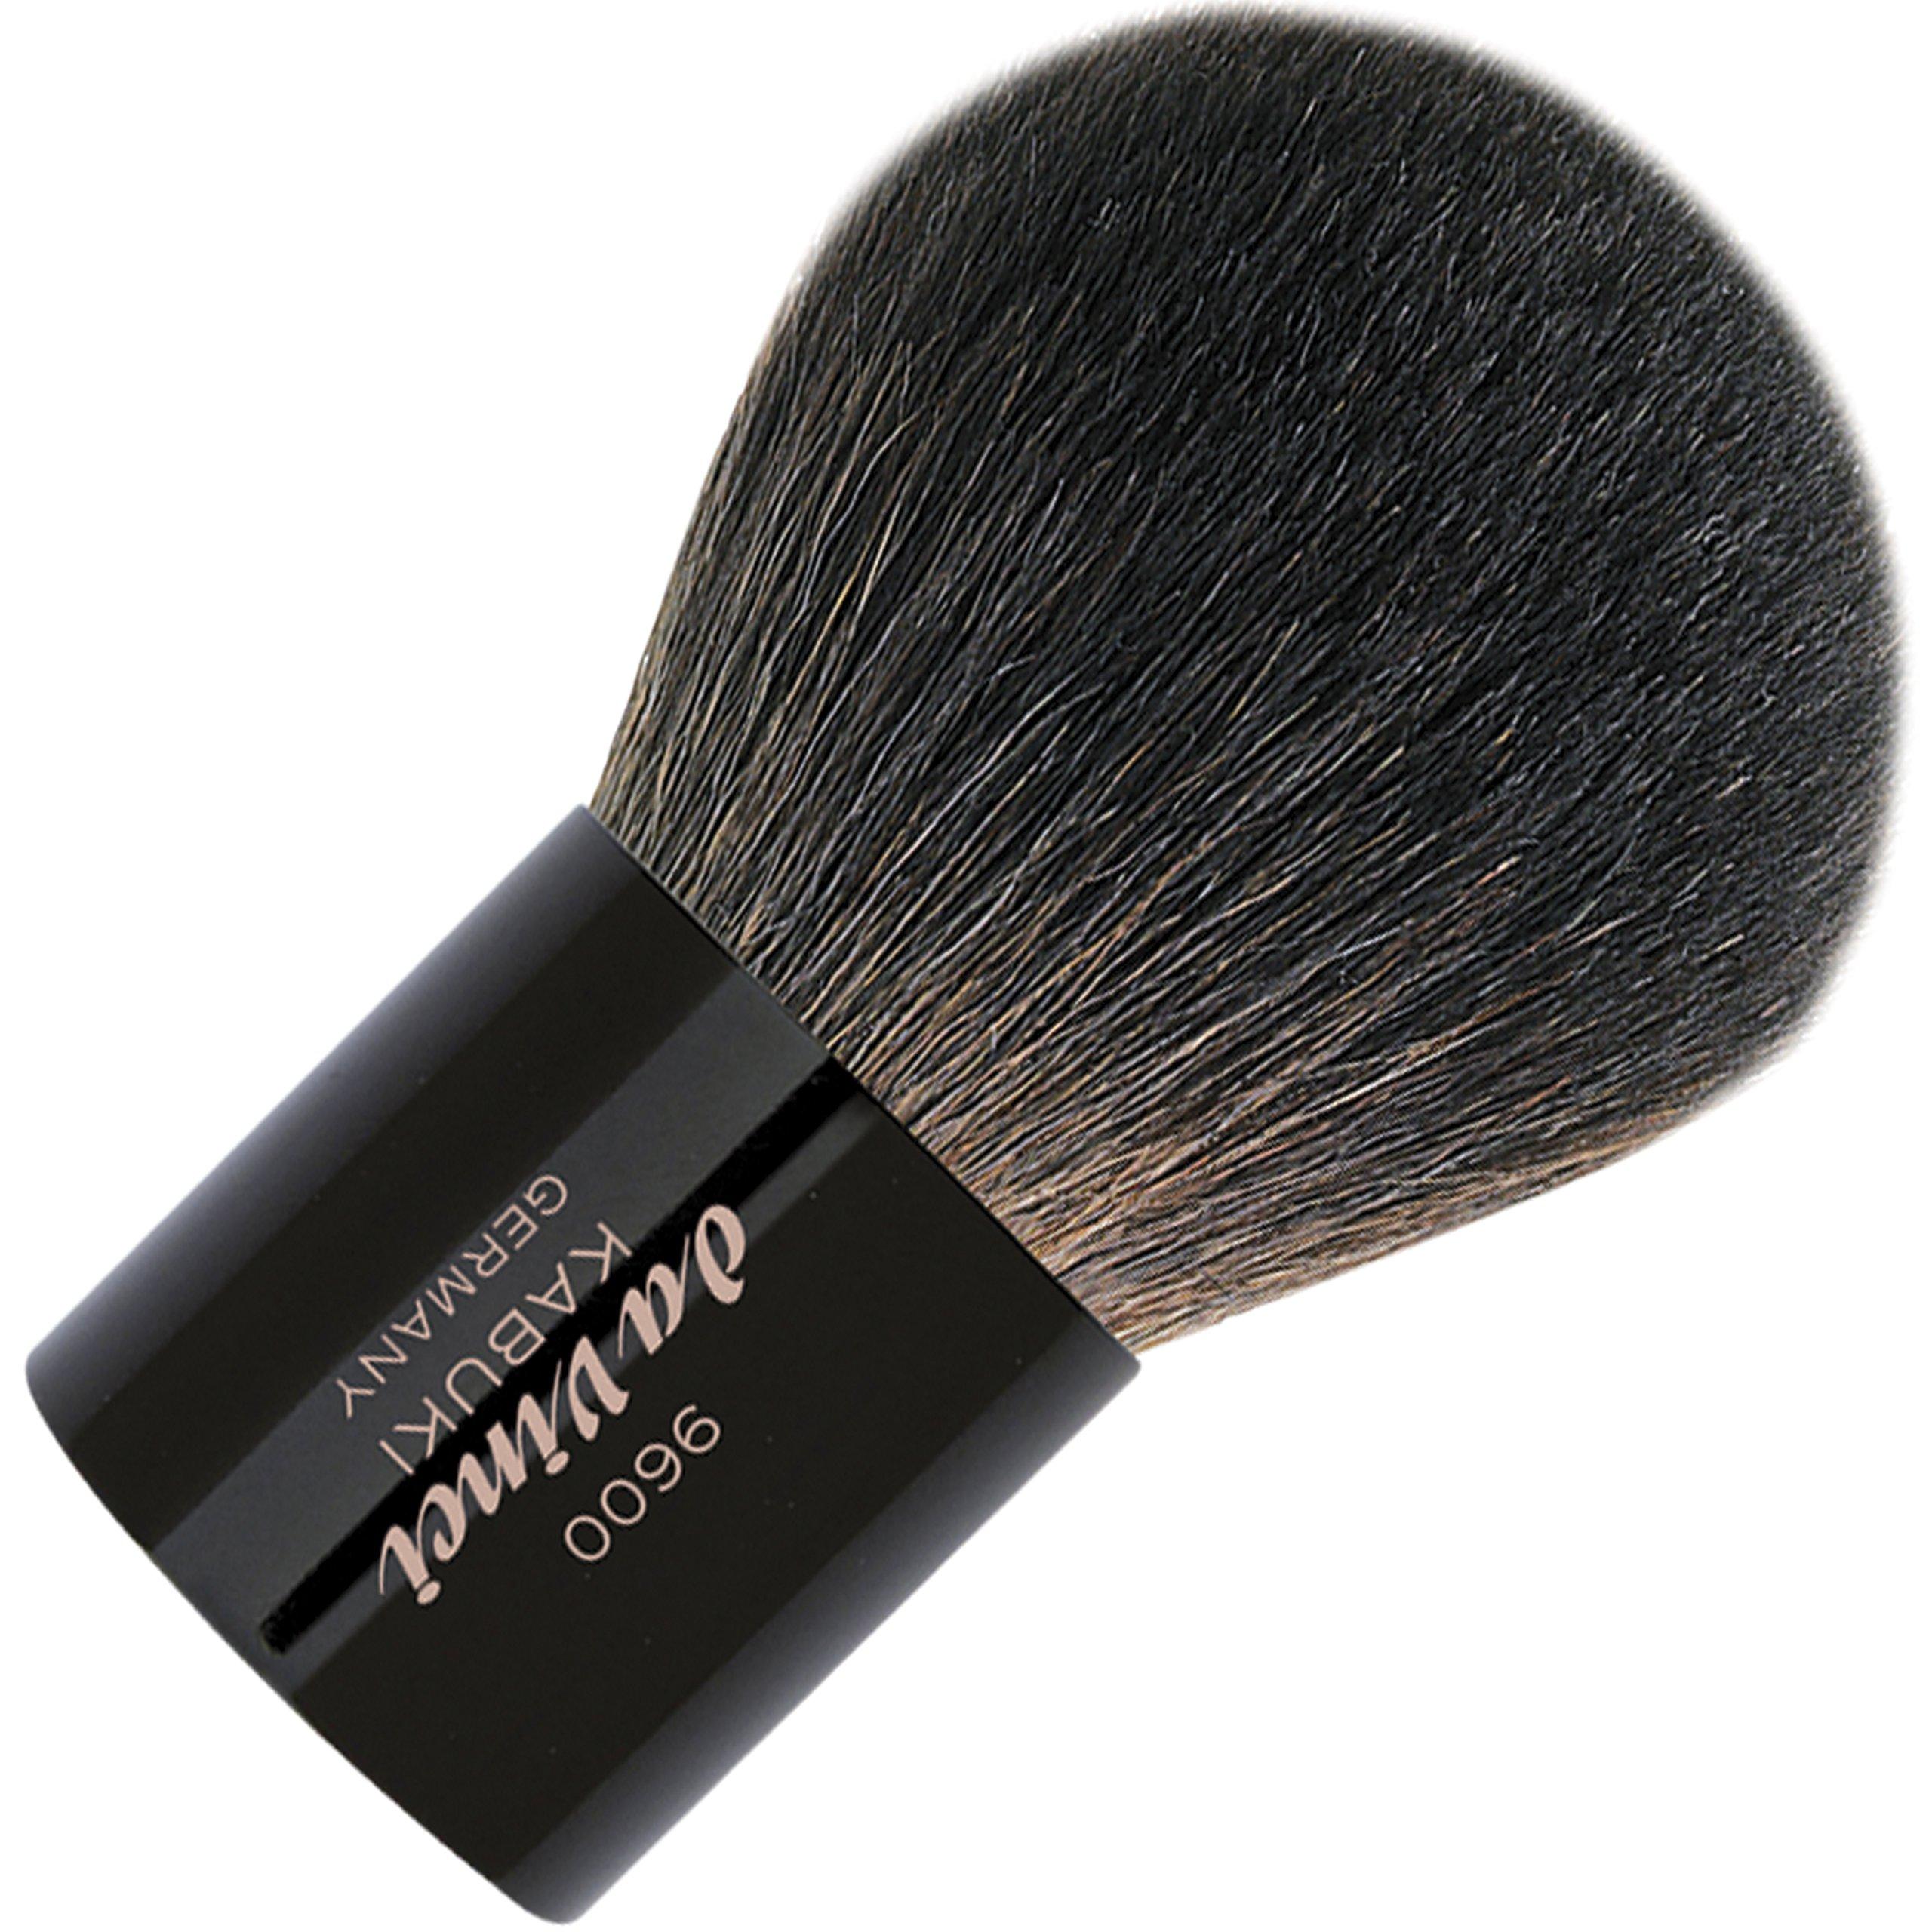 da Vinci Cosmetics Series 9600 Kabuki Powder Brush, Round Natural Hair with Black Freestanding Handle, Leather Case, 38.4 Gram